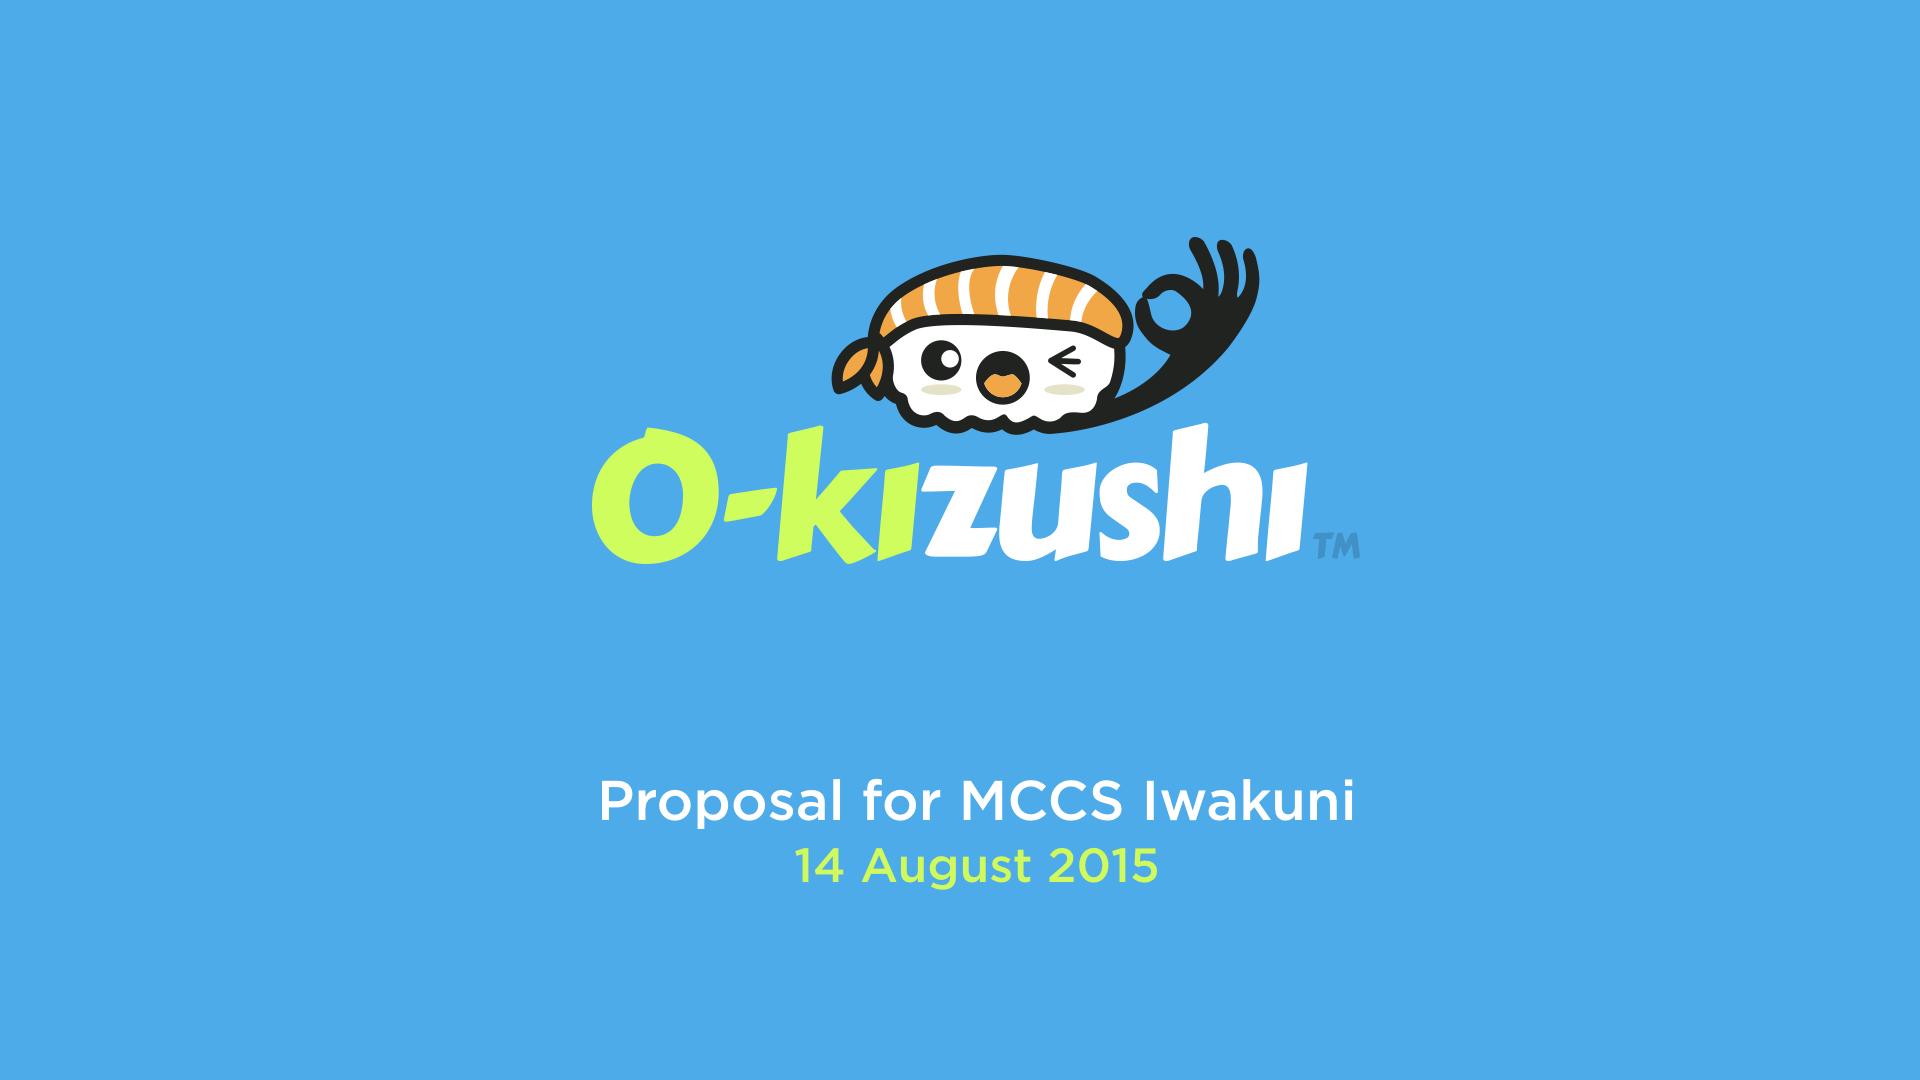 o-kizushi-proposal-mccs02.001.jpeg